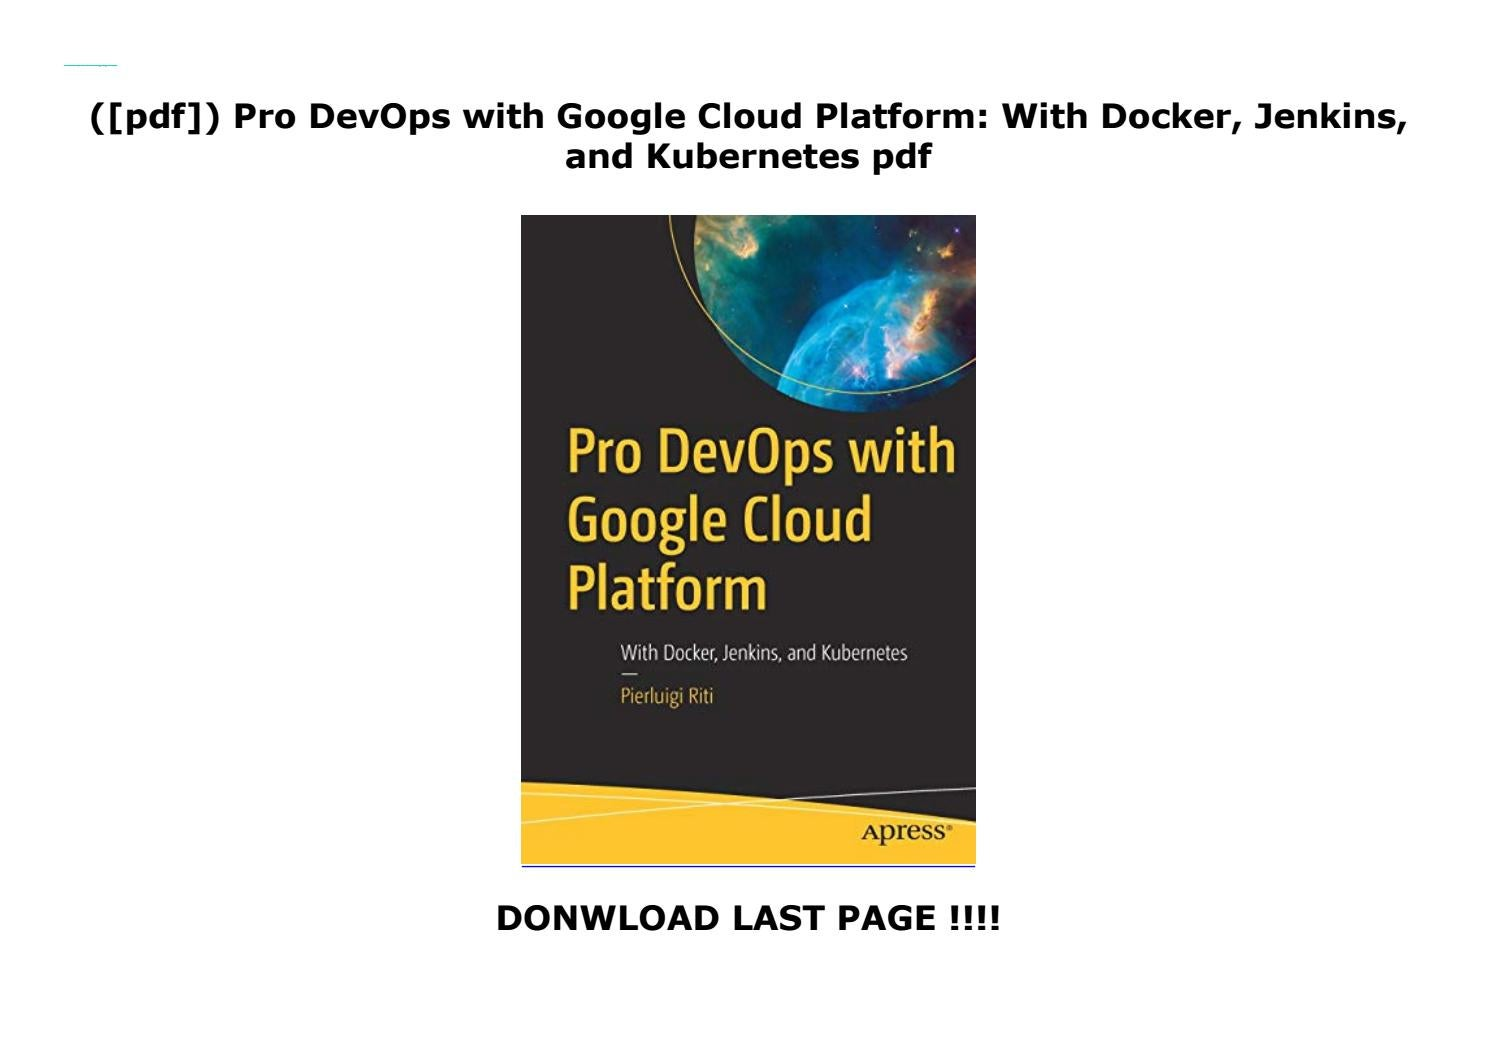 Pro DevOps with Google Cloud Platform: With Docker, Jenkins